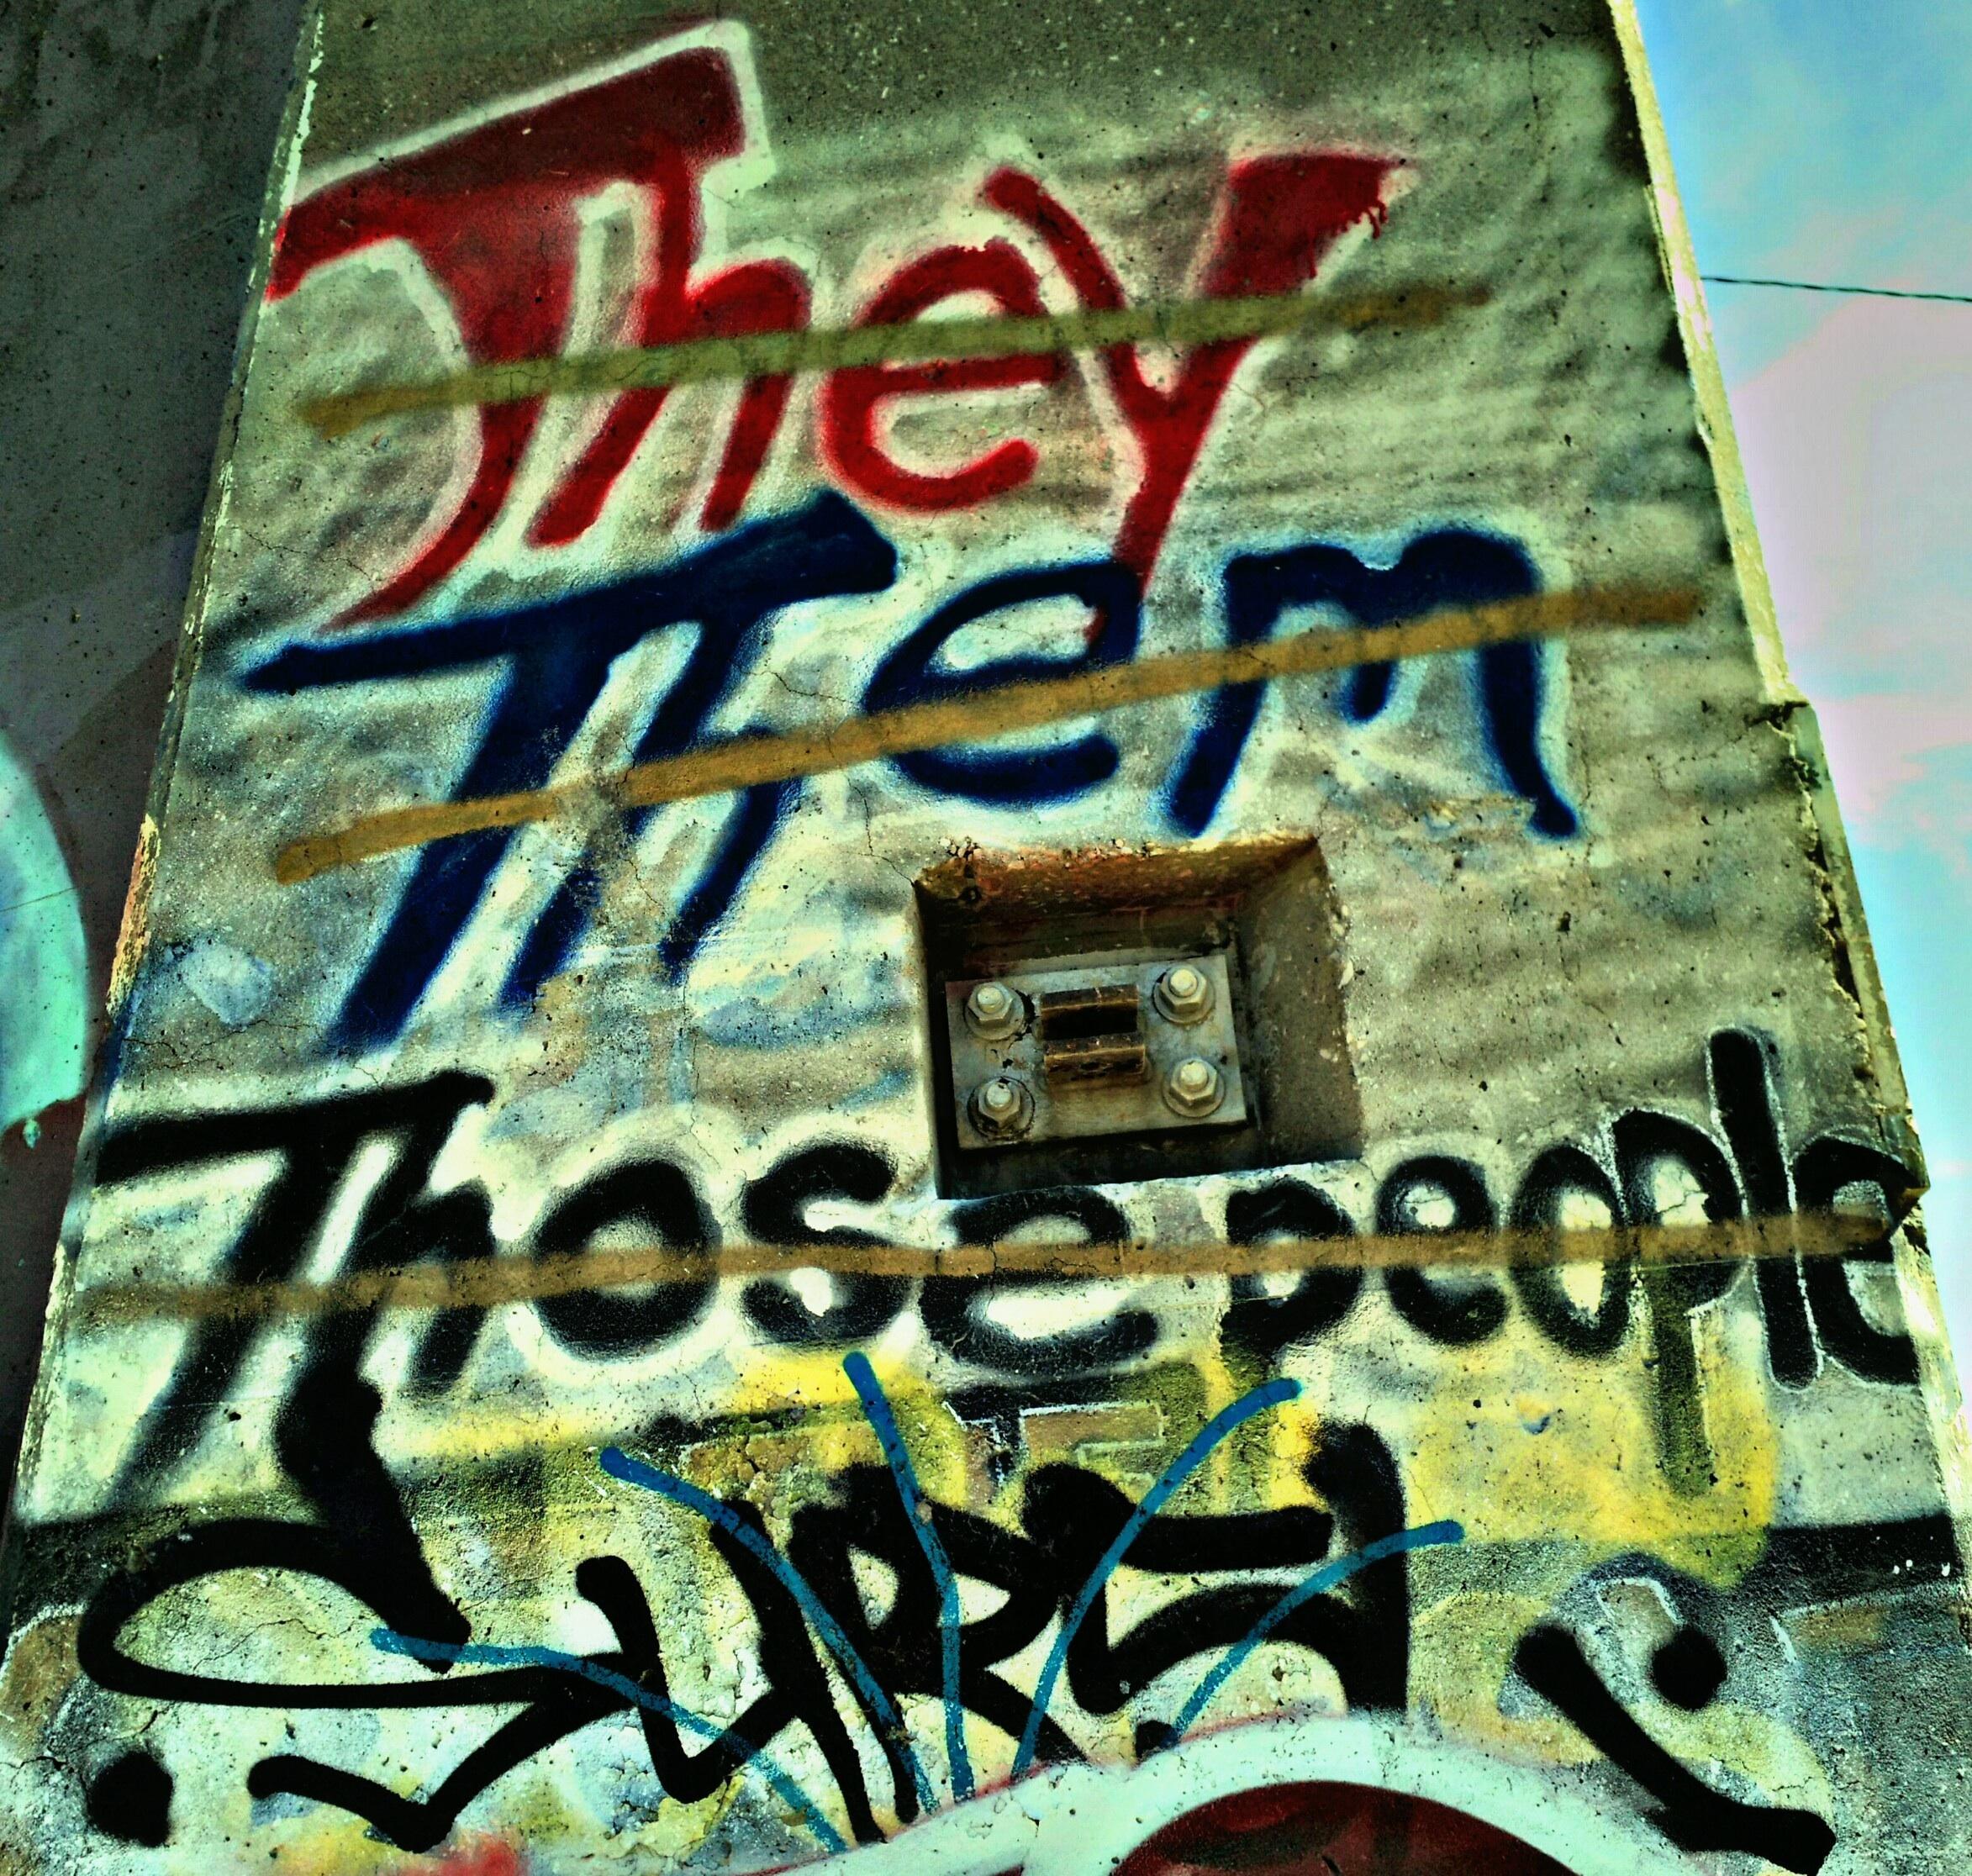 Free Images : number, color, graffiti, font, art 2346x2232 - - 97828 ...